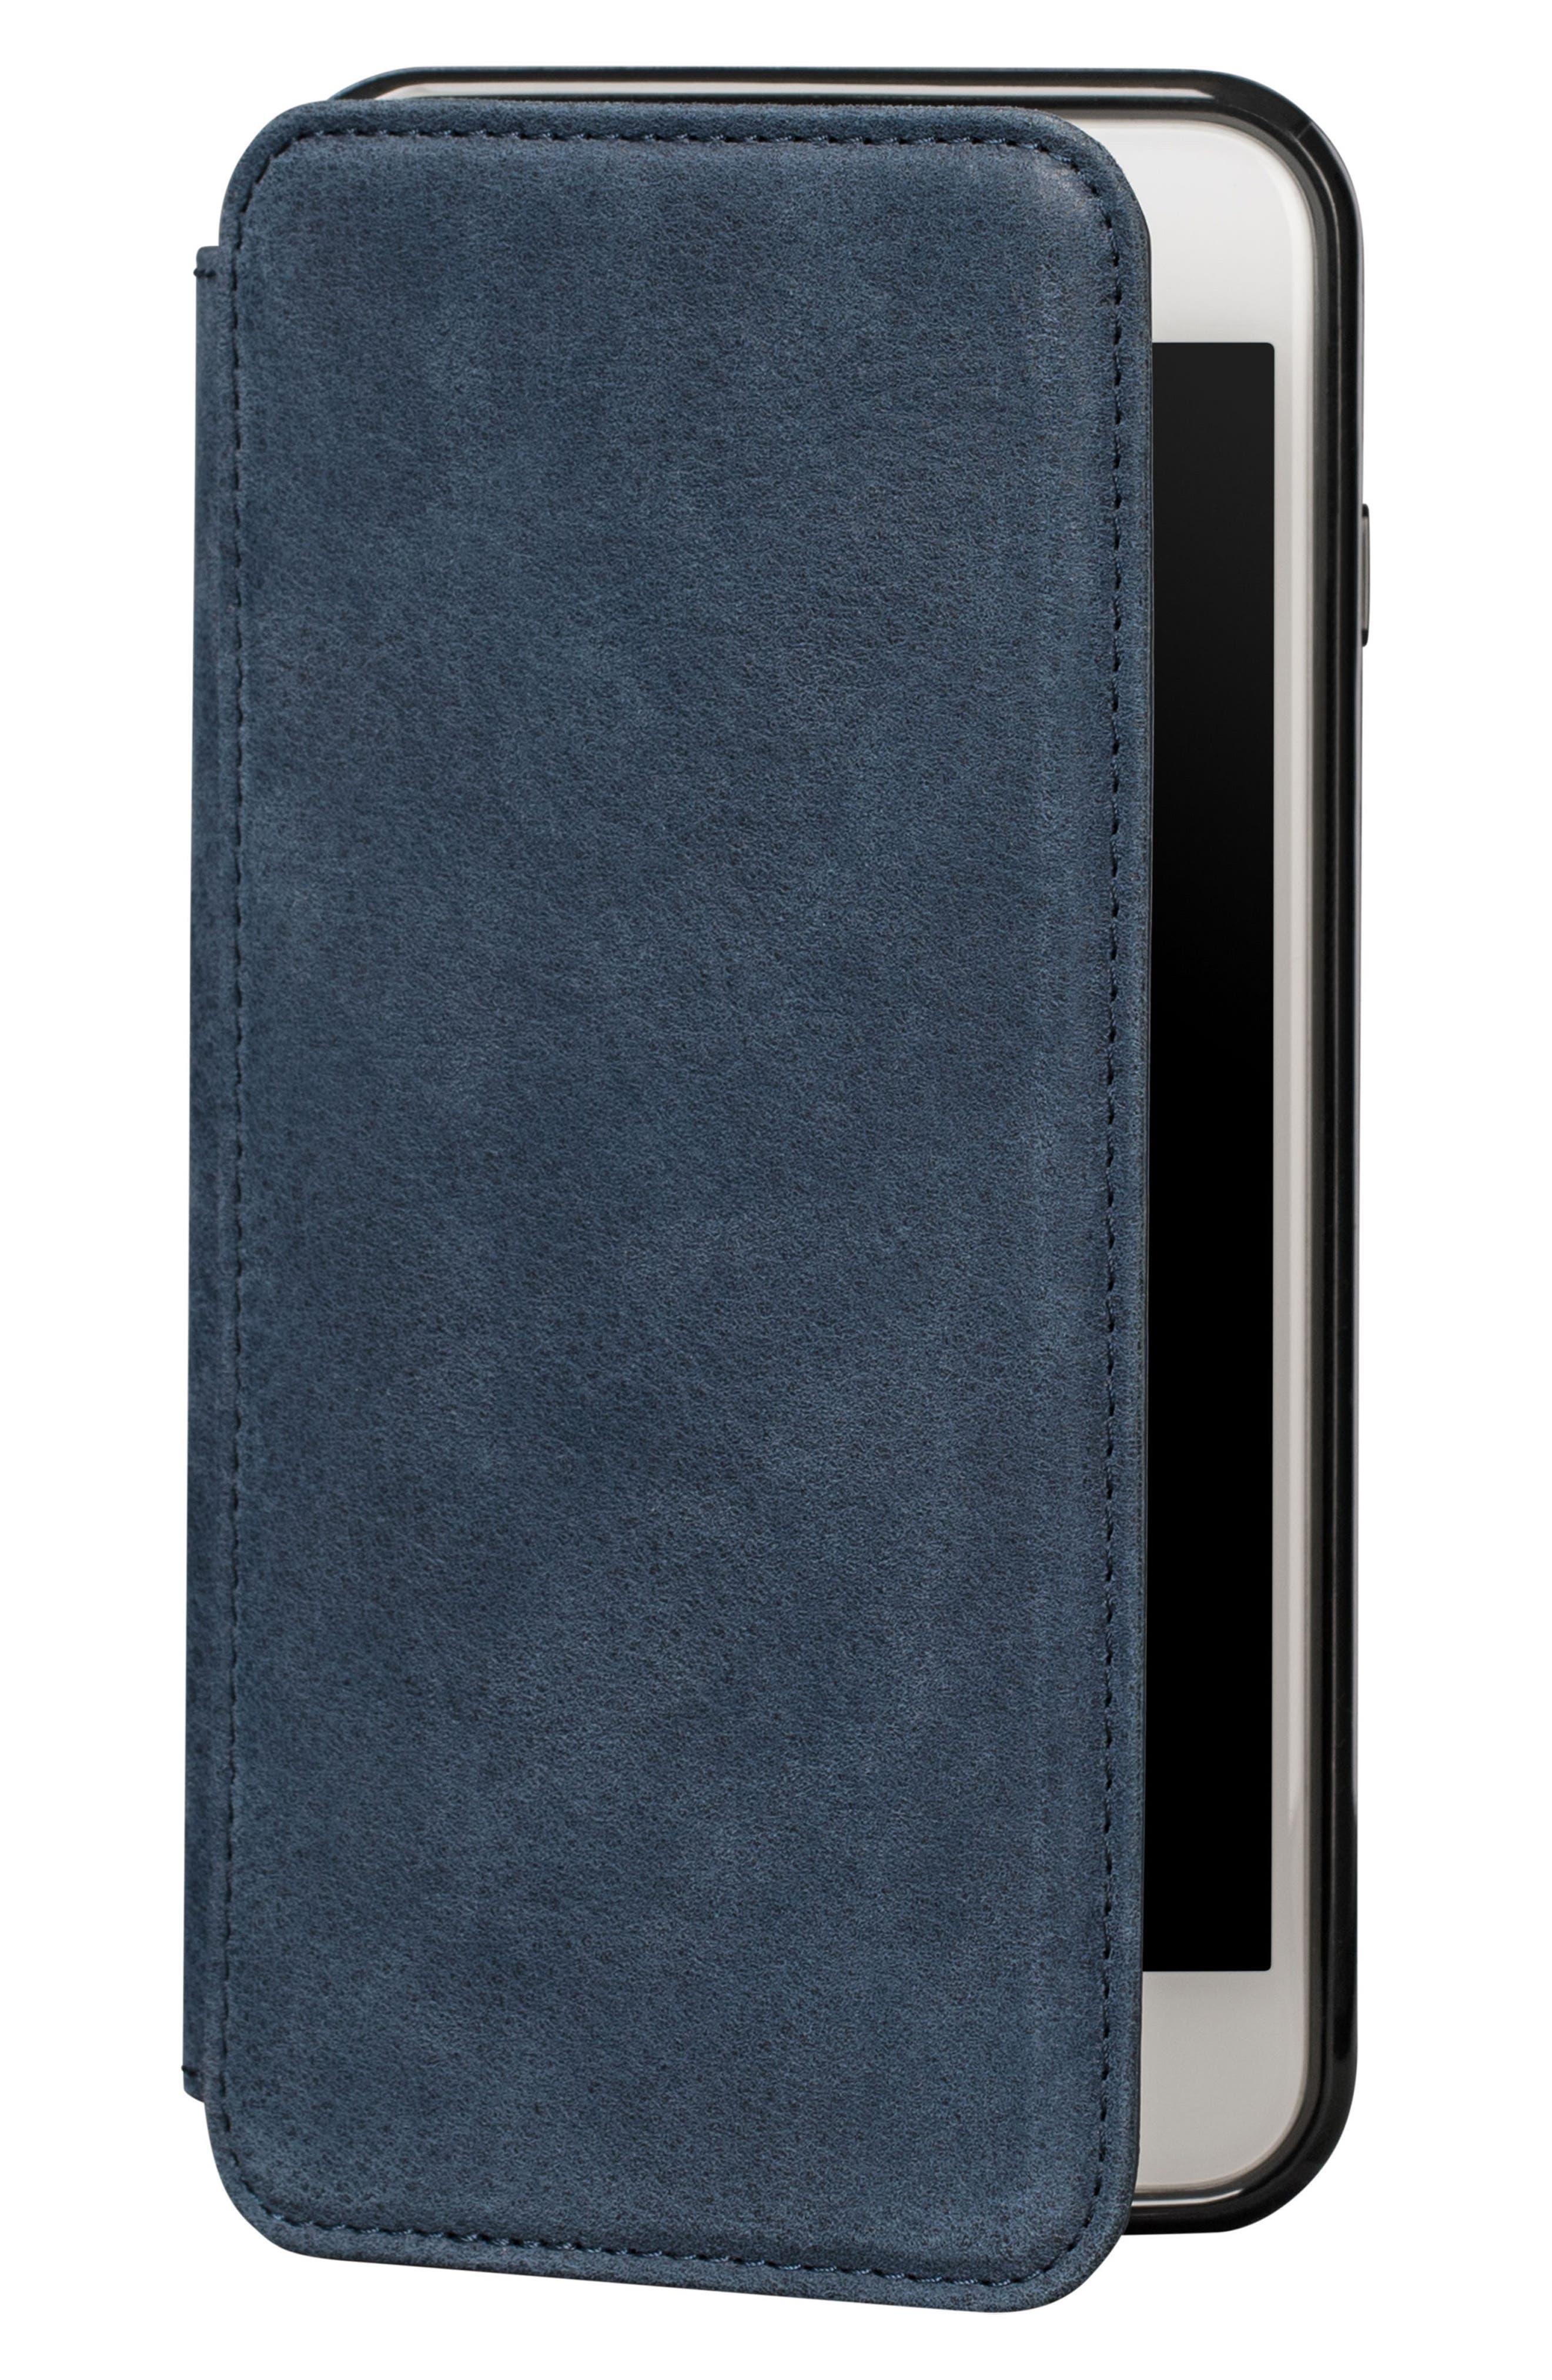 Bence iPhone 7/8 Plus Walletbook,                             Main thumbnail 1, color,                             Denim